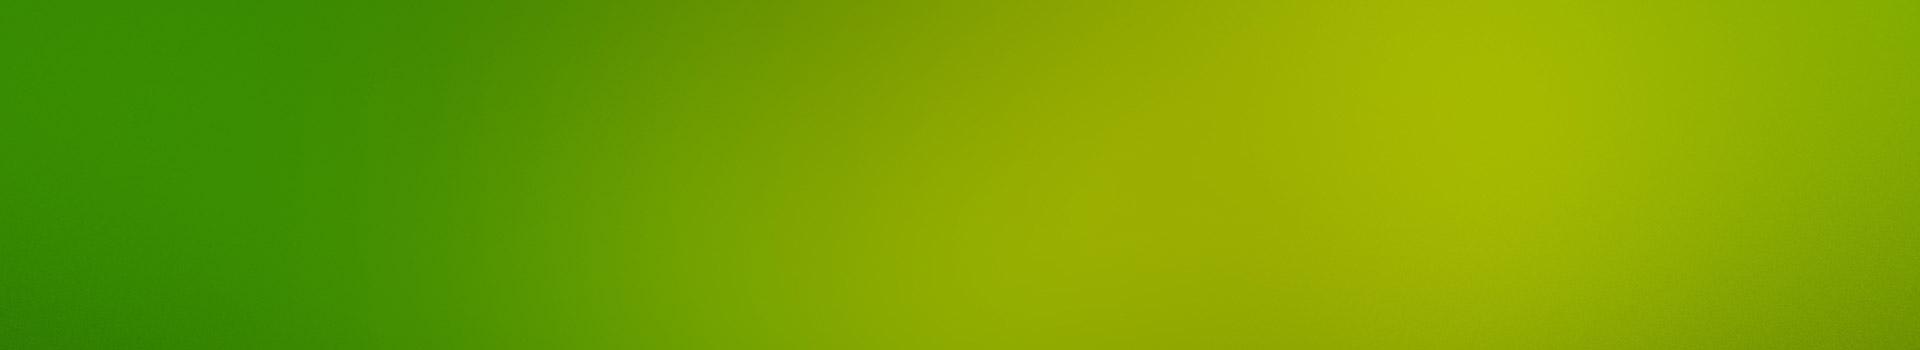 зелёная раскрутка сайтов